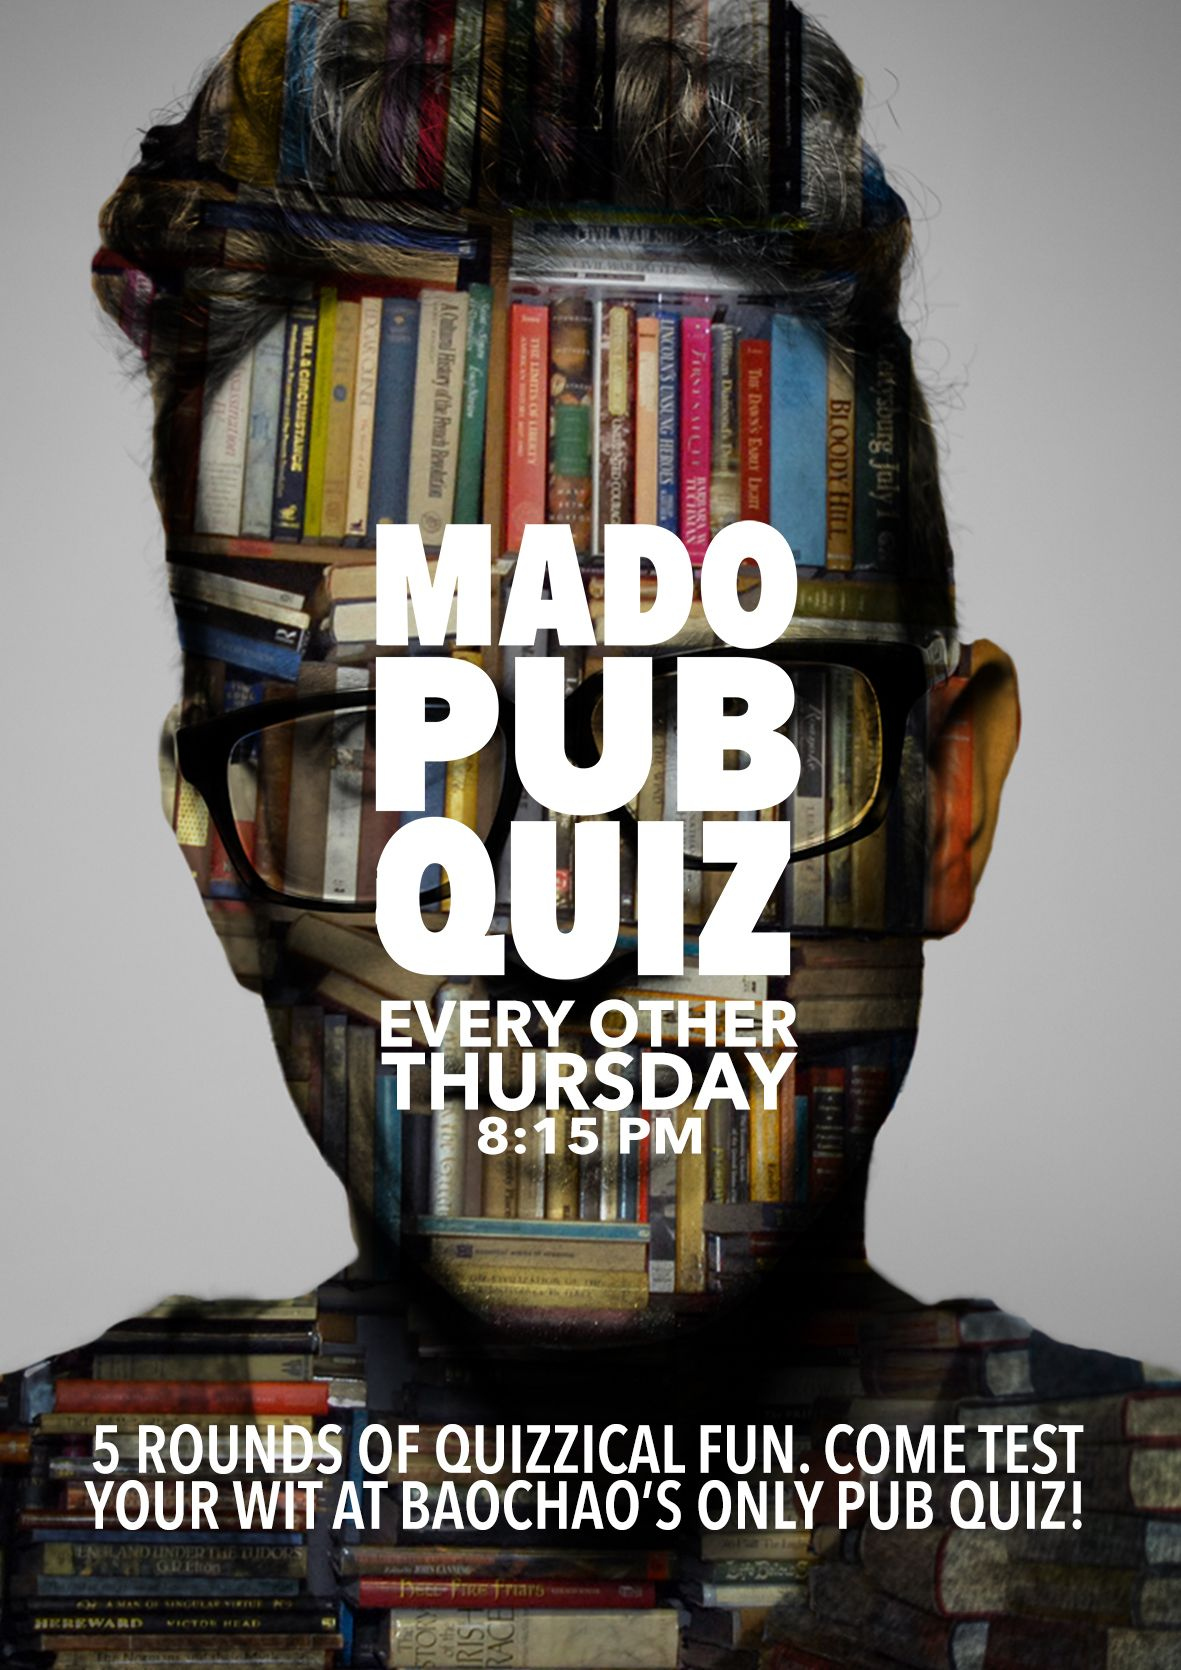 Poster design for quiz - Behance Editing Mado Pub Quiz Nights Poster